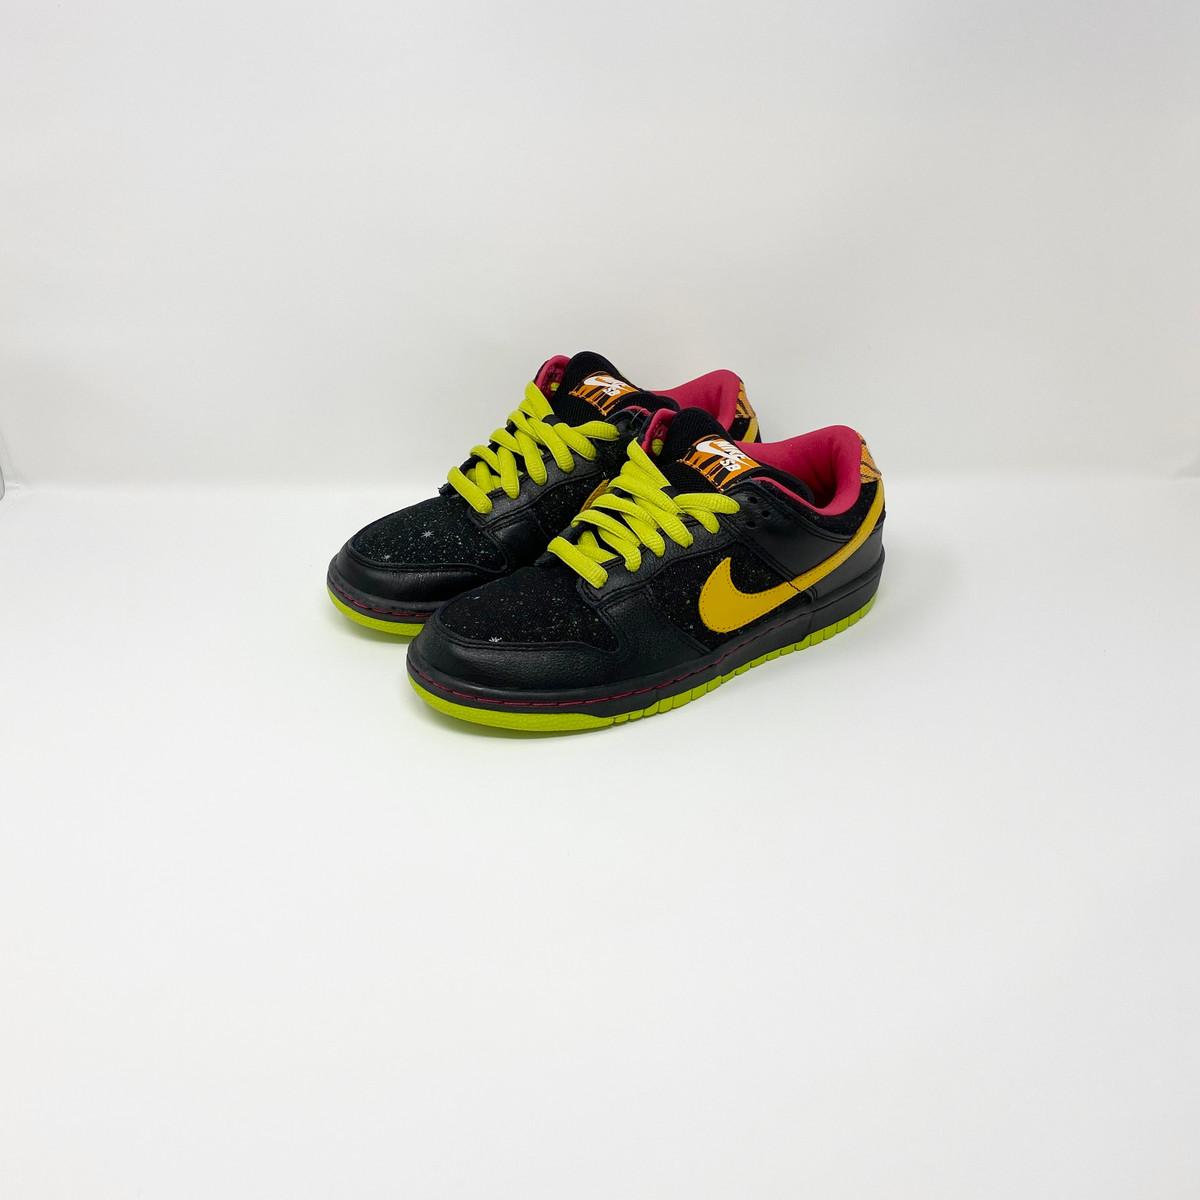 Nike Dunk Low Prem SB Space Tiger